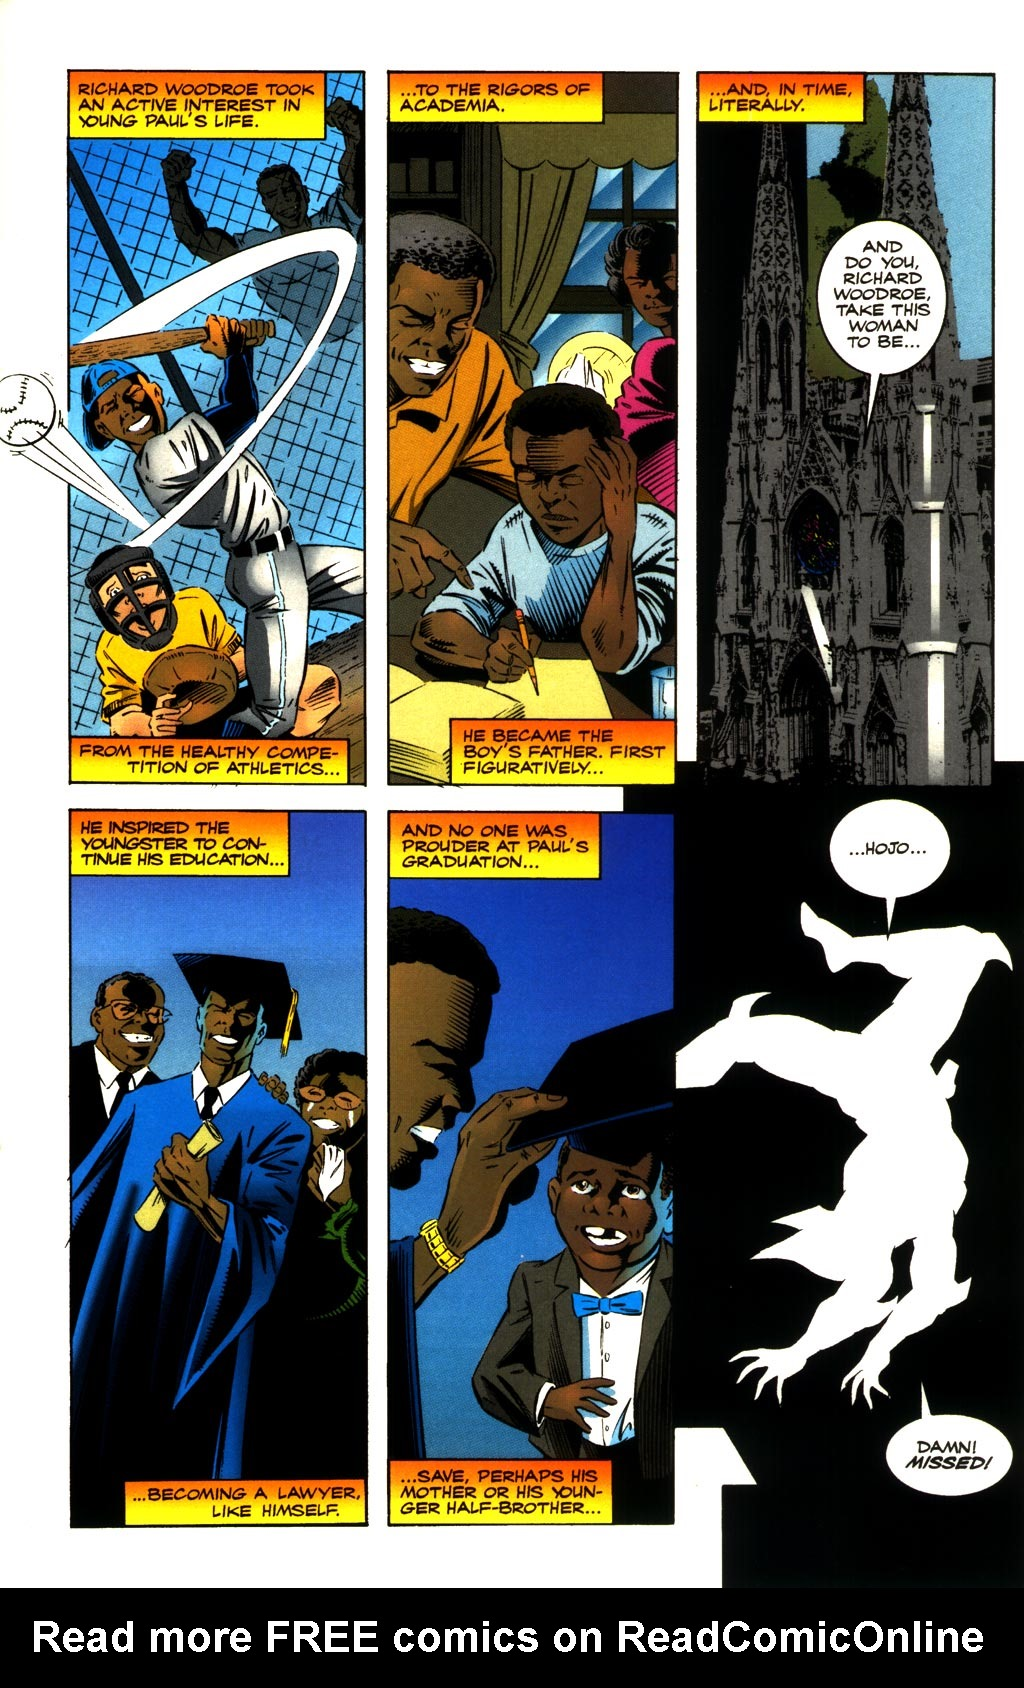 Read online ShadowHawk comic -  Issue #8 - 15